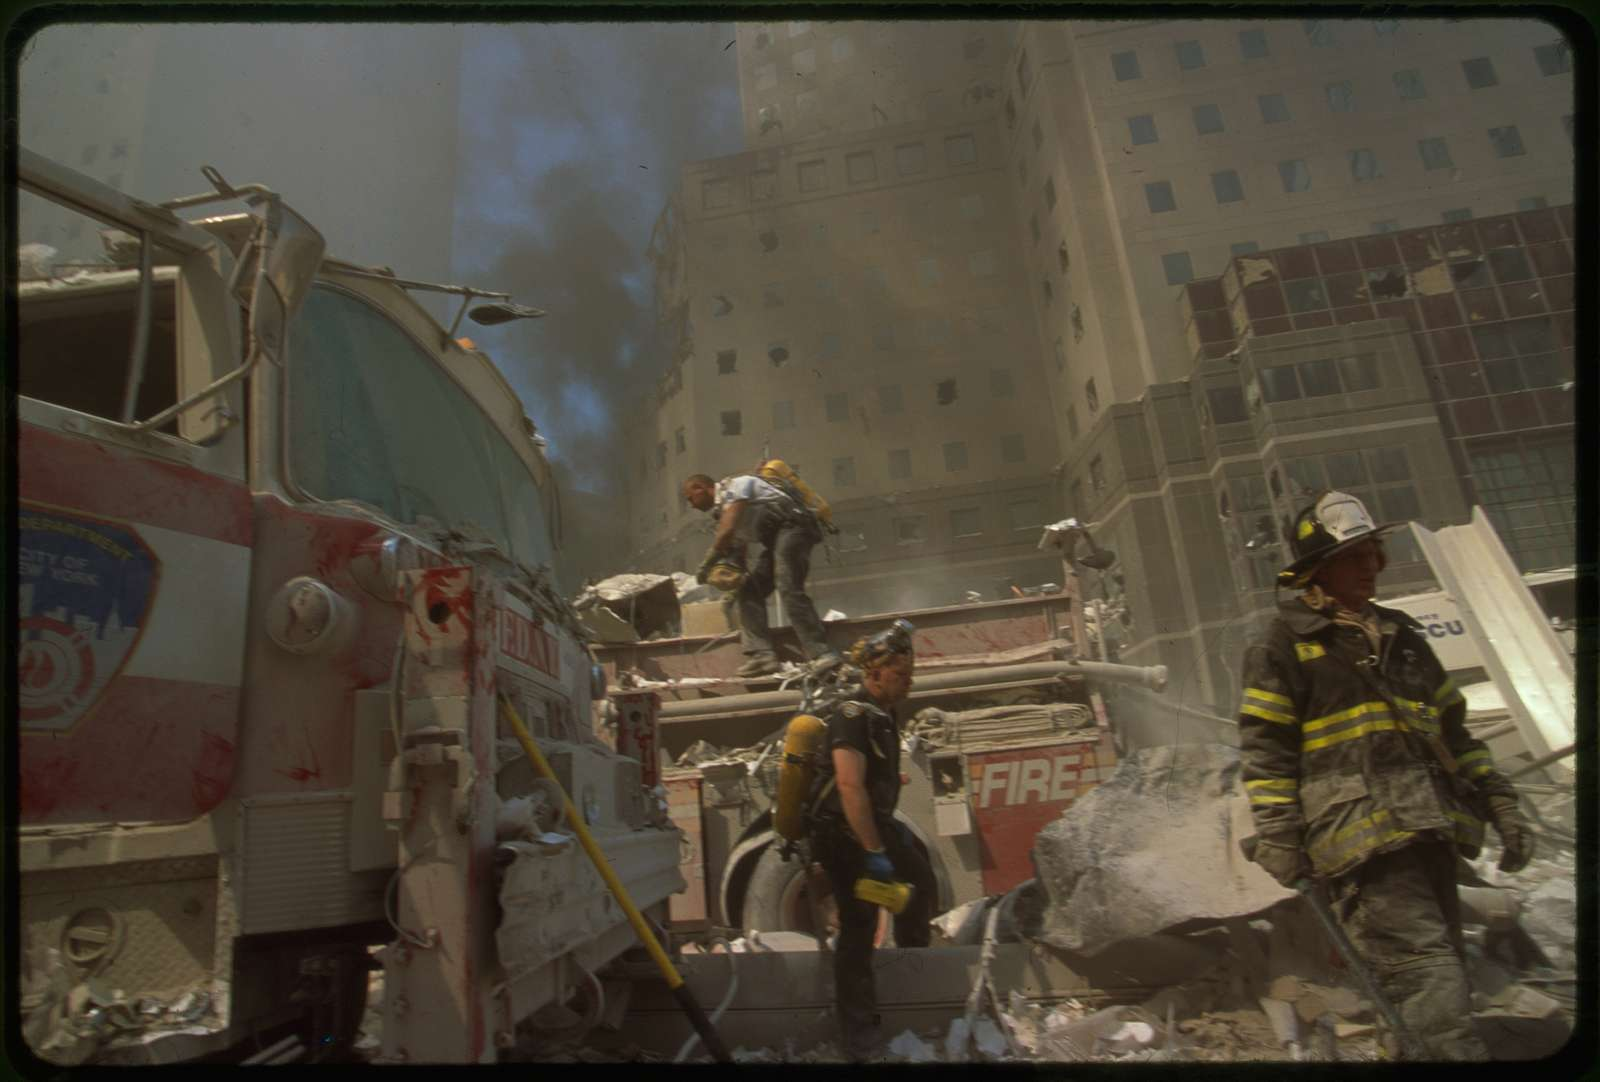 [New York City fire fighters amid debris following September 11th terrorist attack on World Trade Center, New York City]